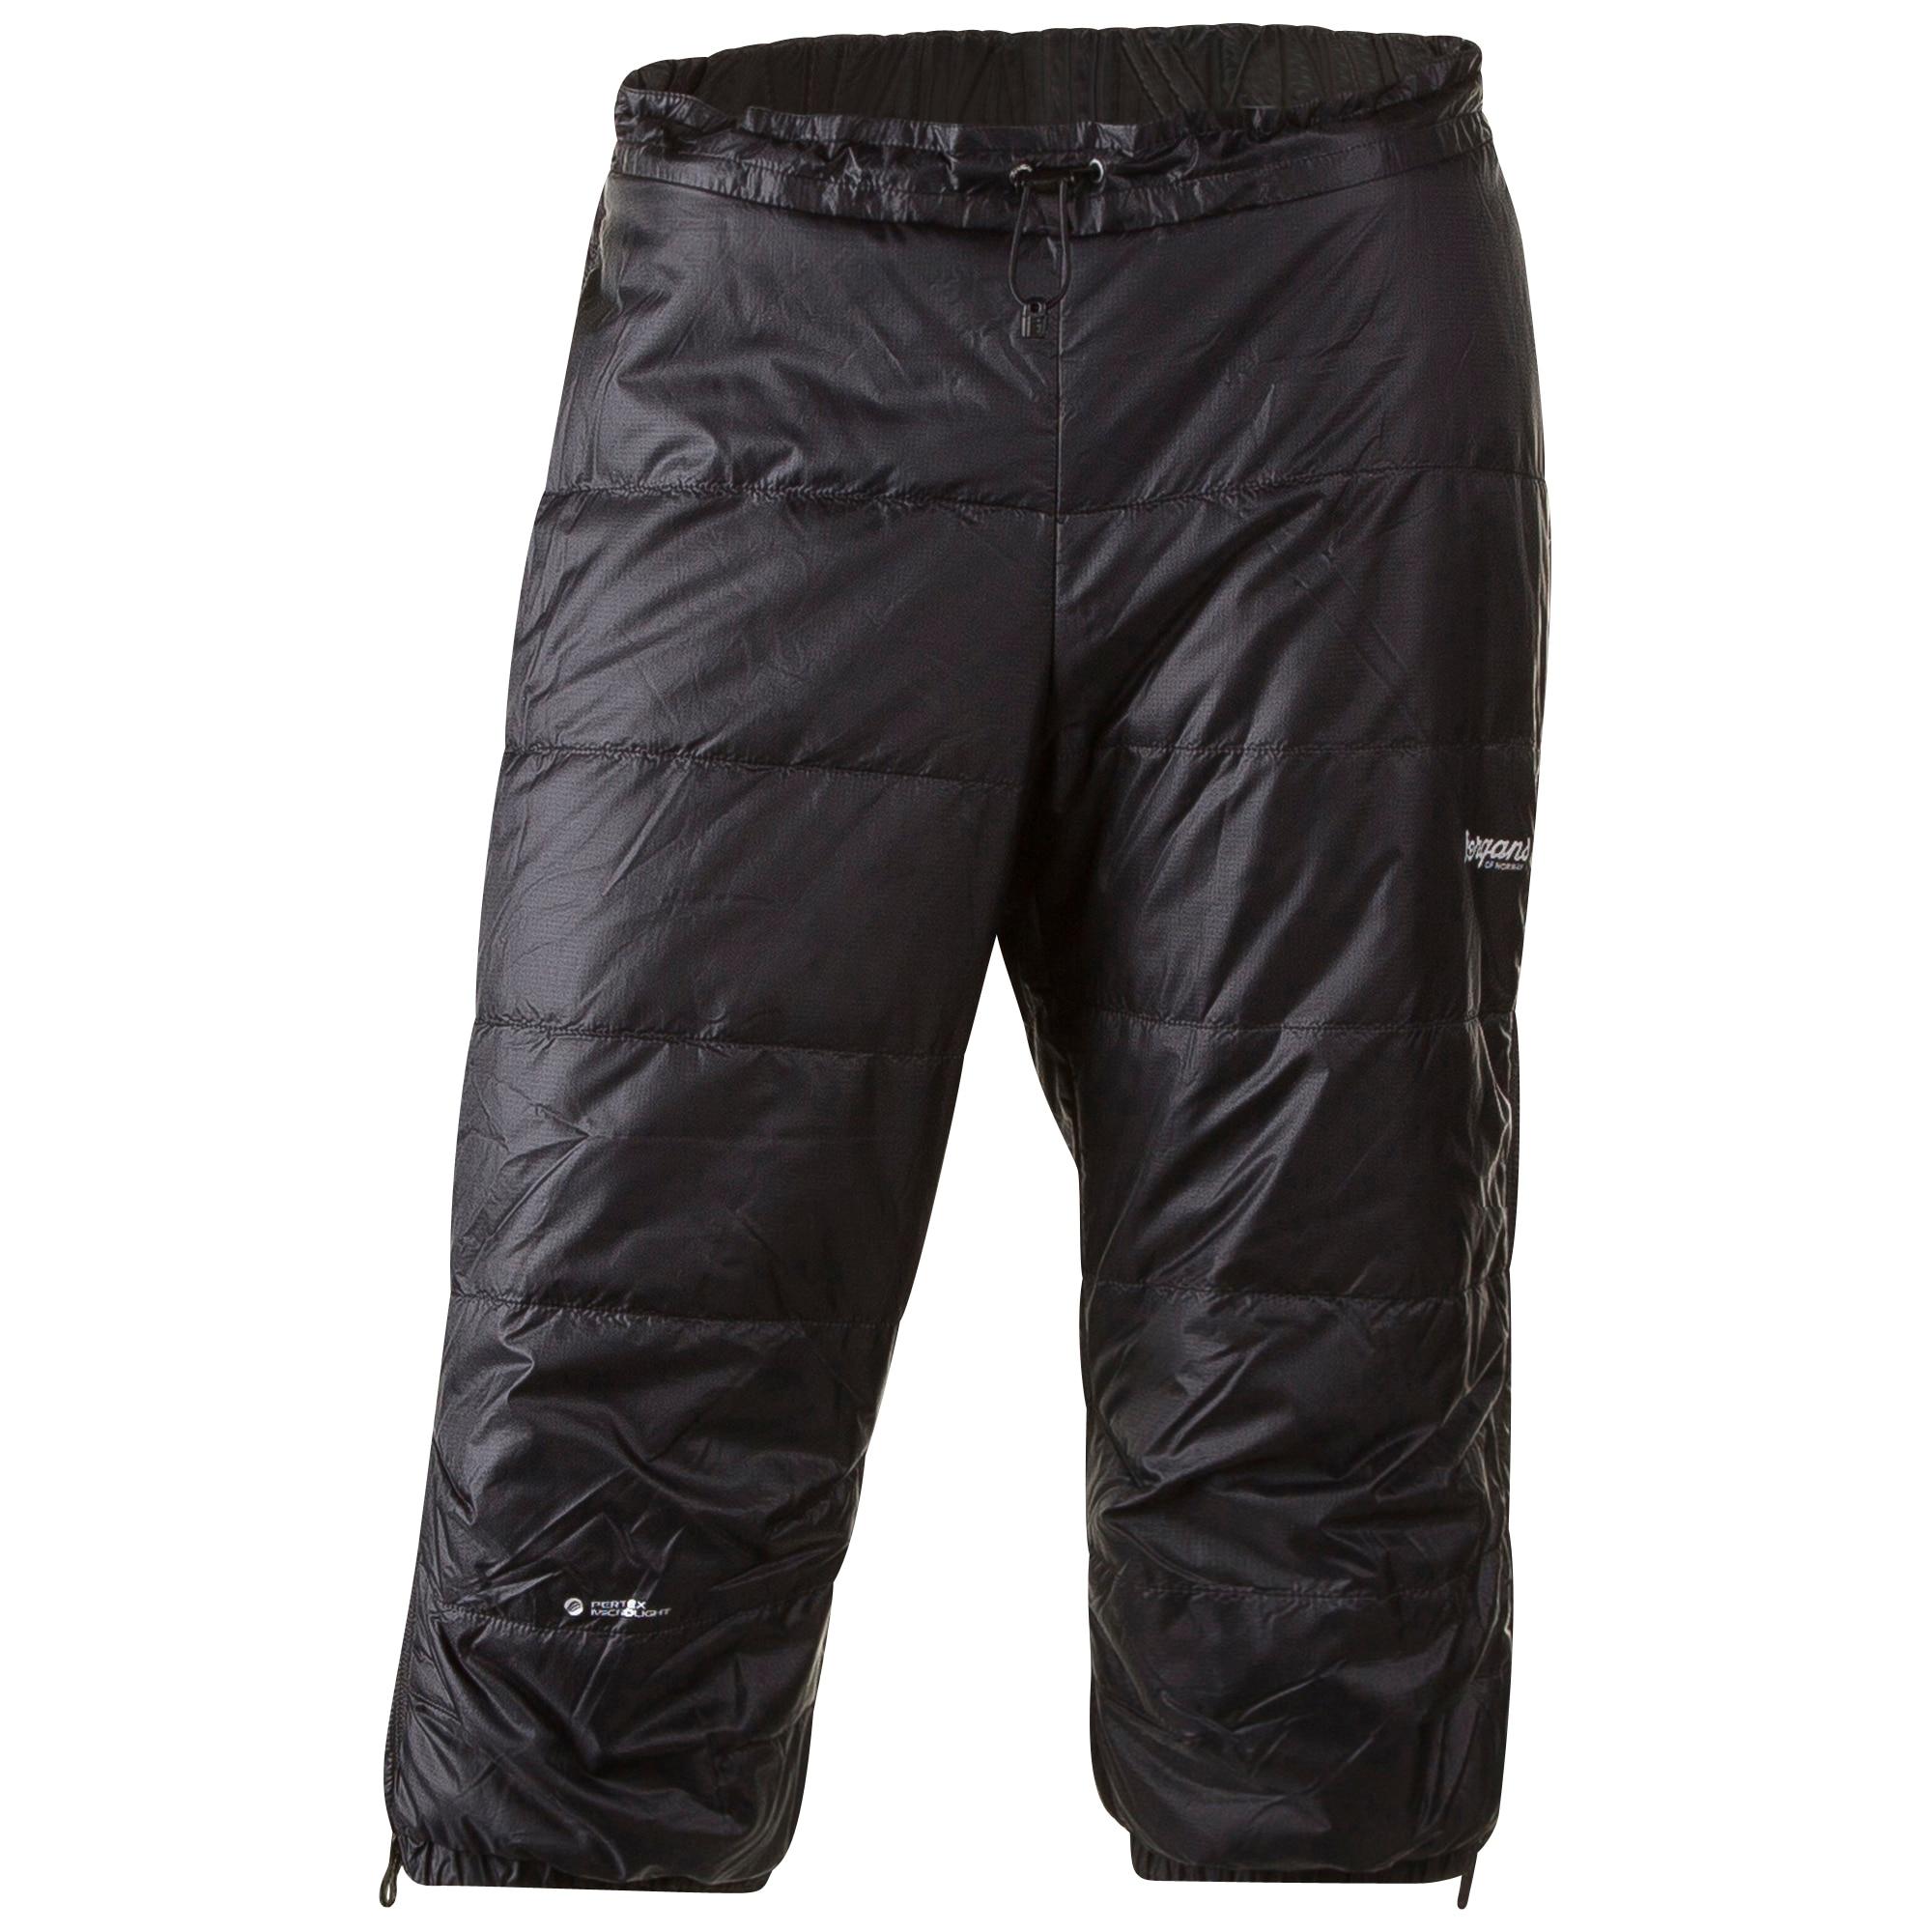 Mjølkedalstind Insulated ¾ Pants